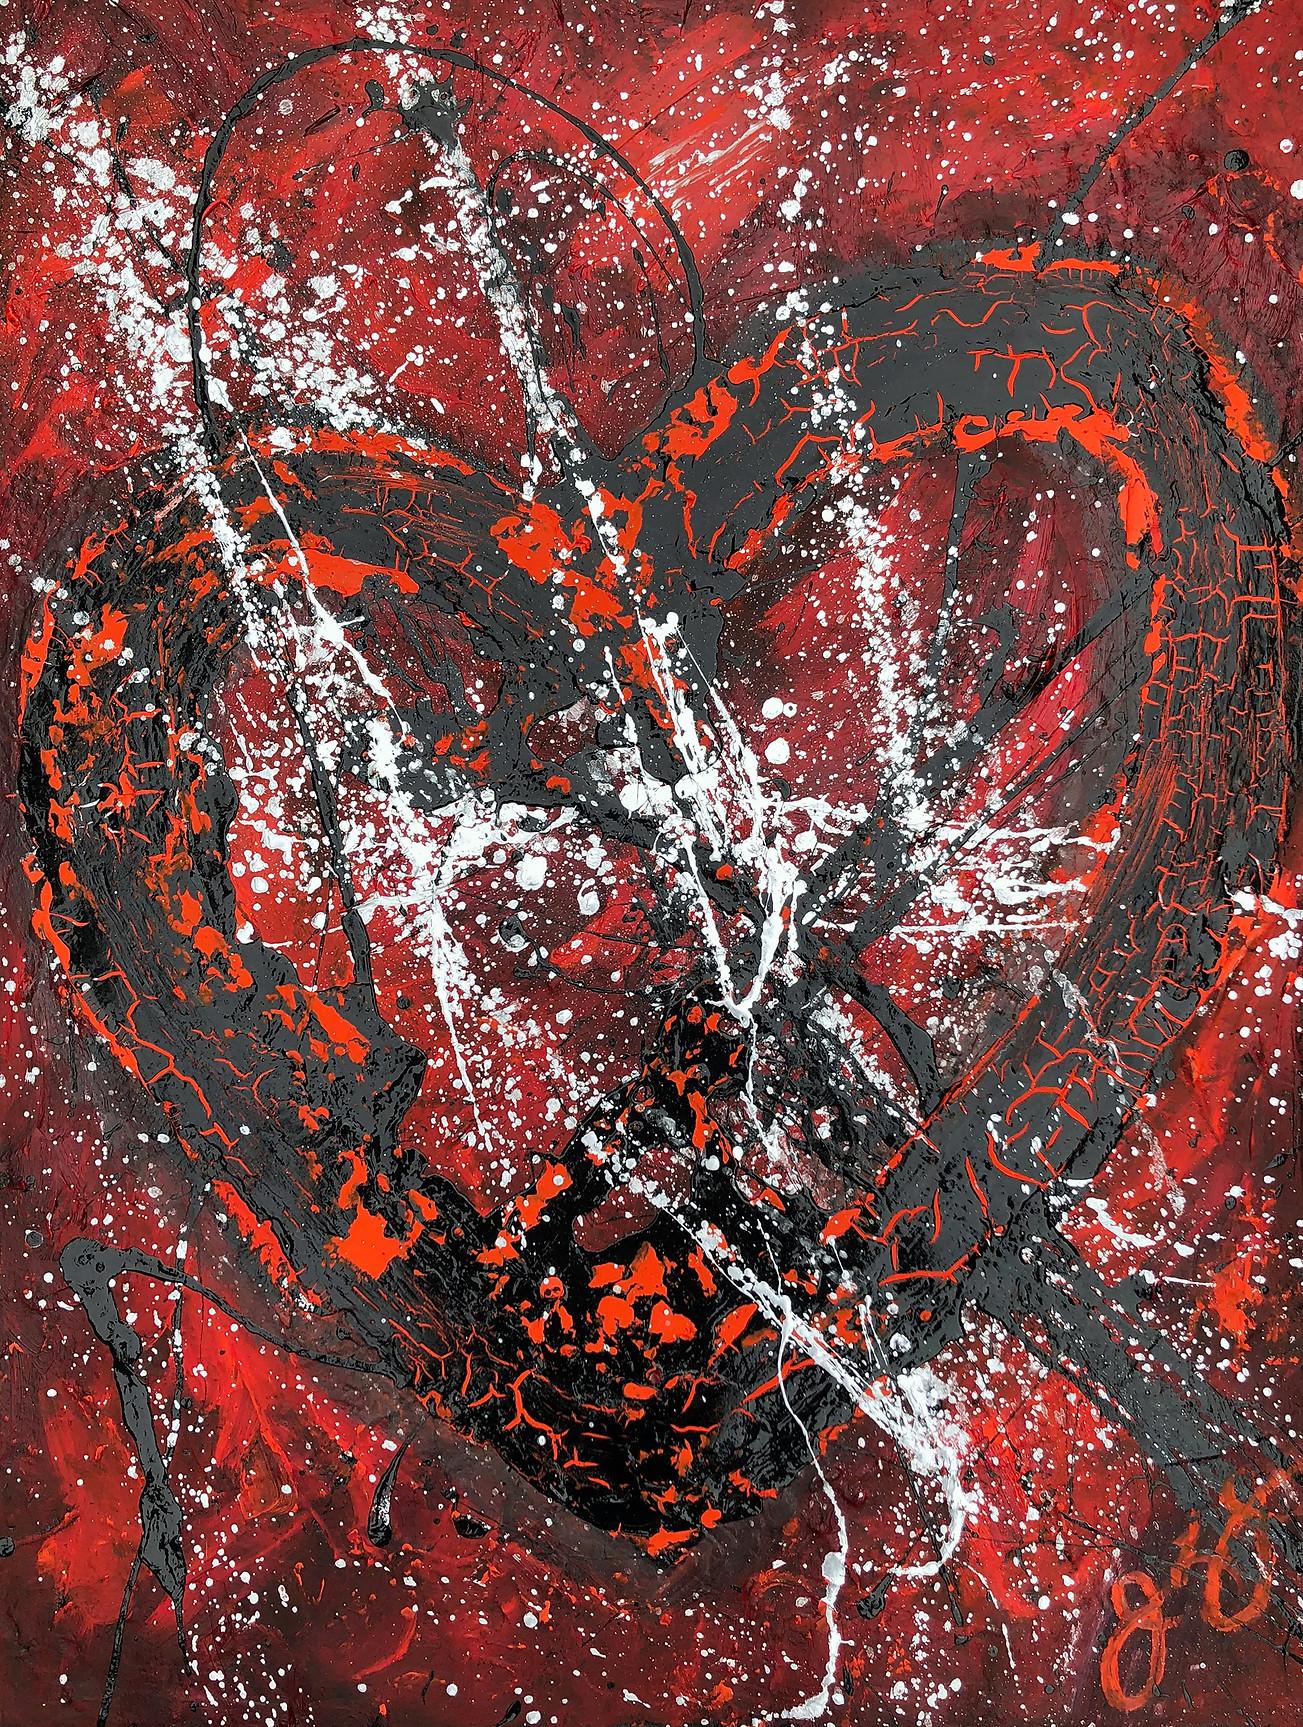 essen's heart 33.jpg